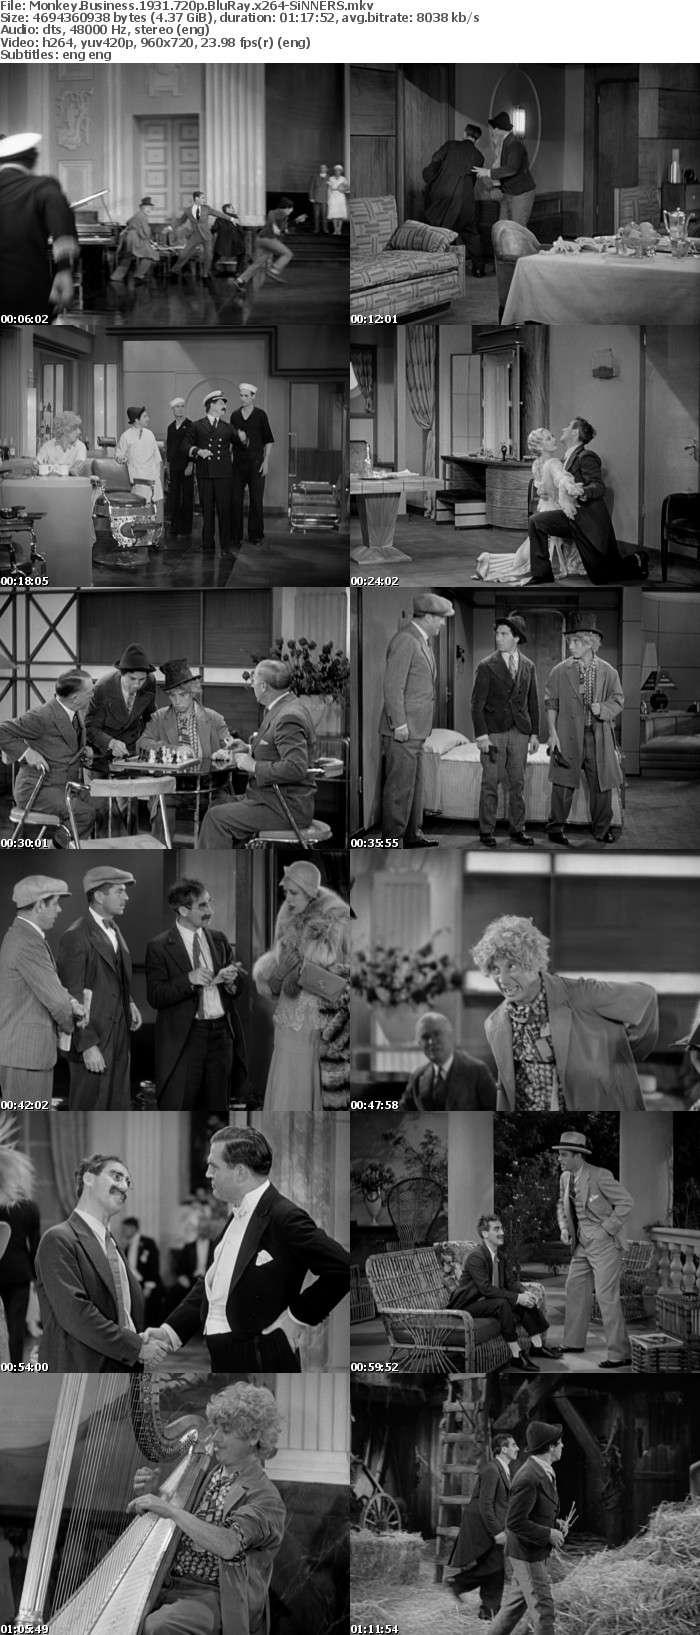 Monkey Business 1931 720p BluRay x264-SiNNERS